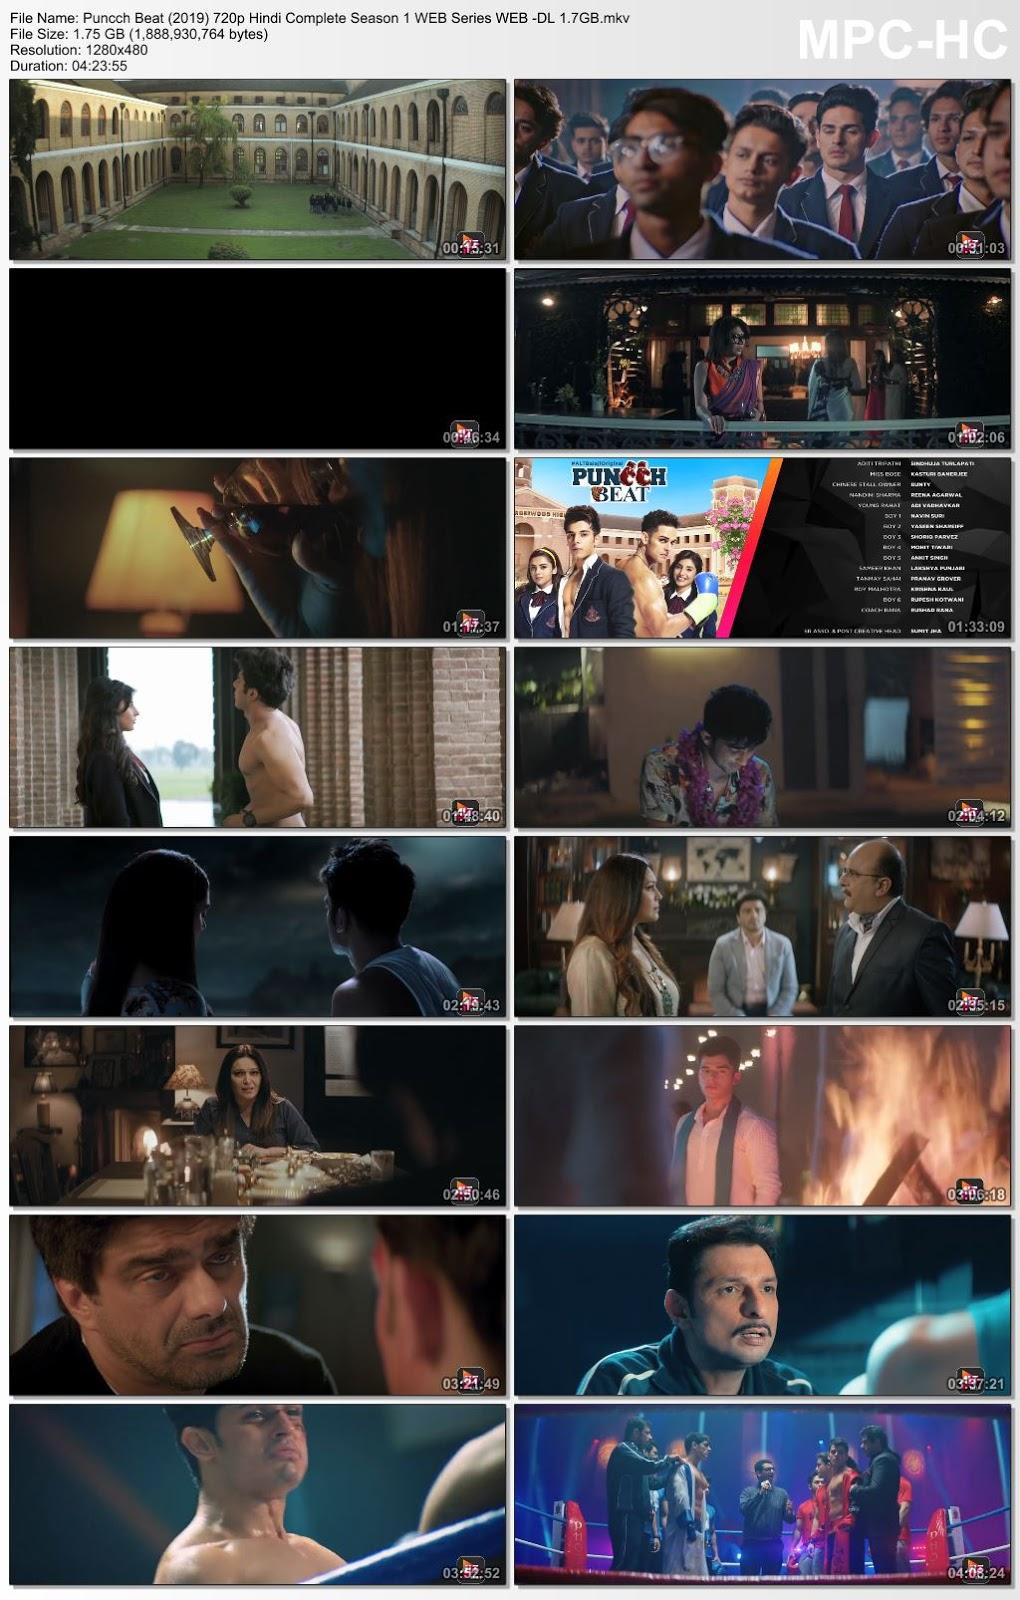 Puncch Beat (2019) 720p Hindi Complete Season 1 WEB Series WEB -DL 1.7GB Desirehub